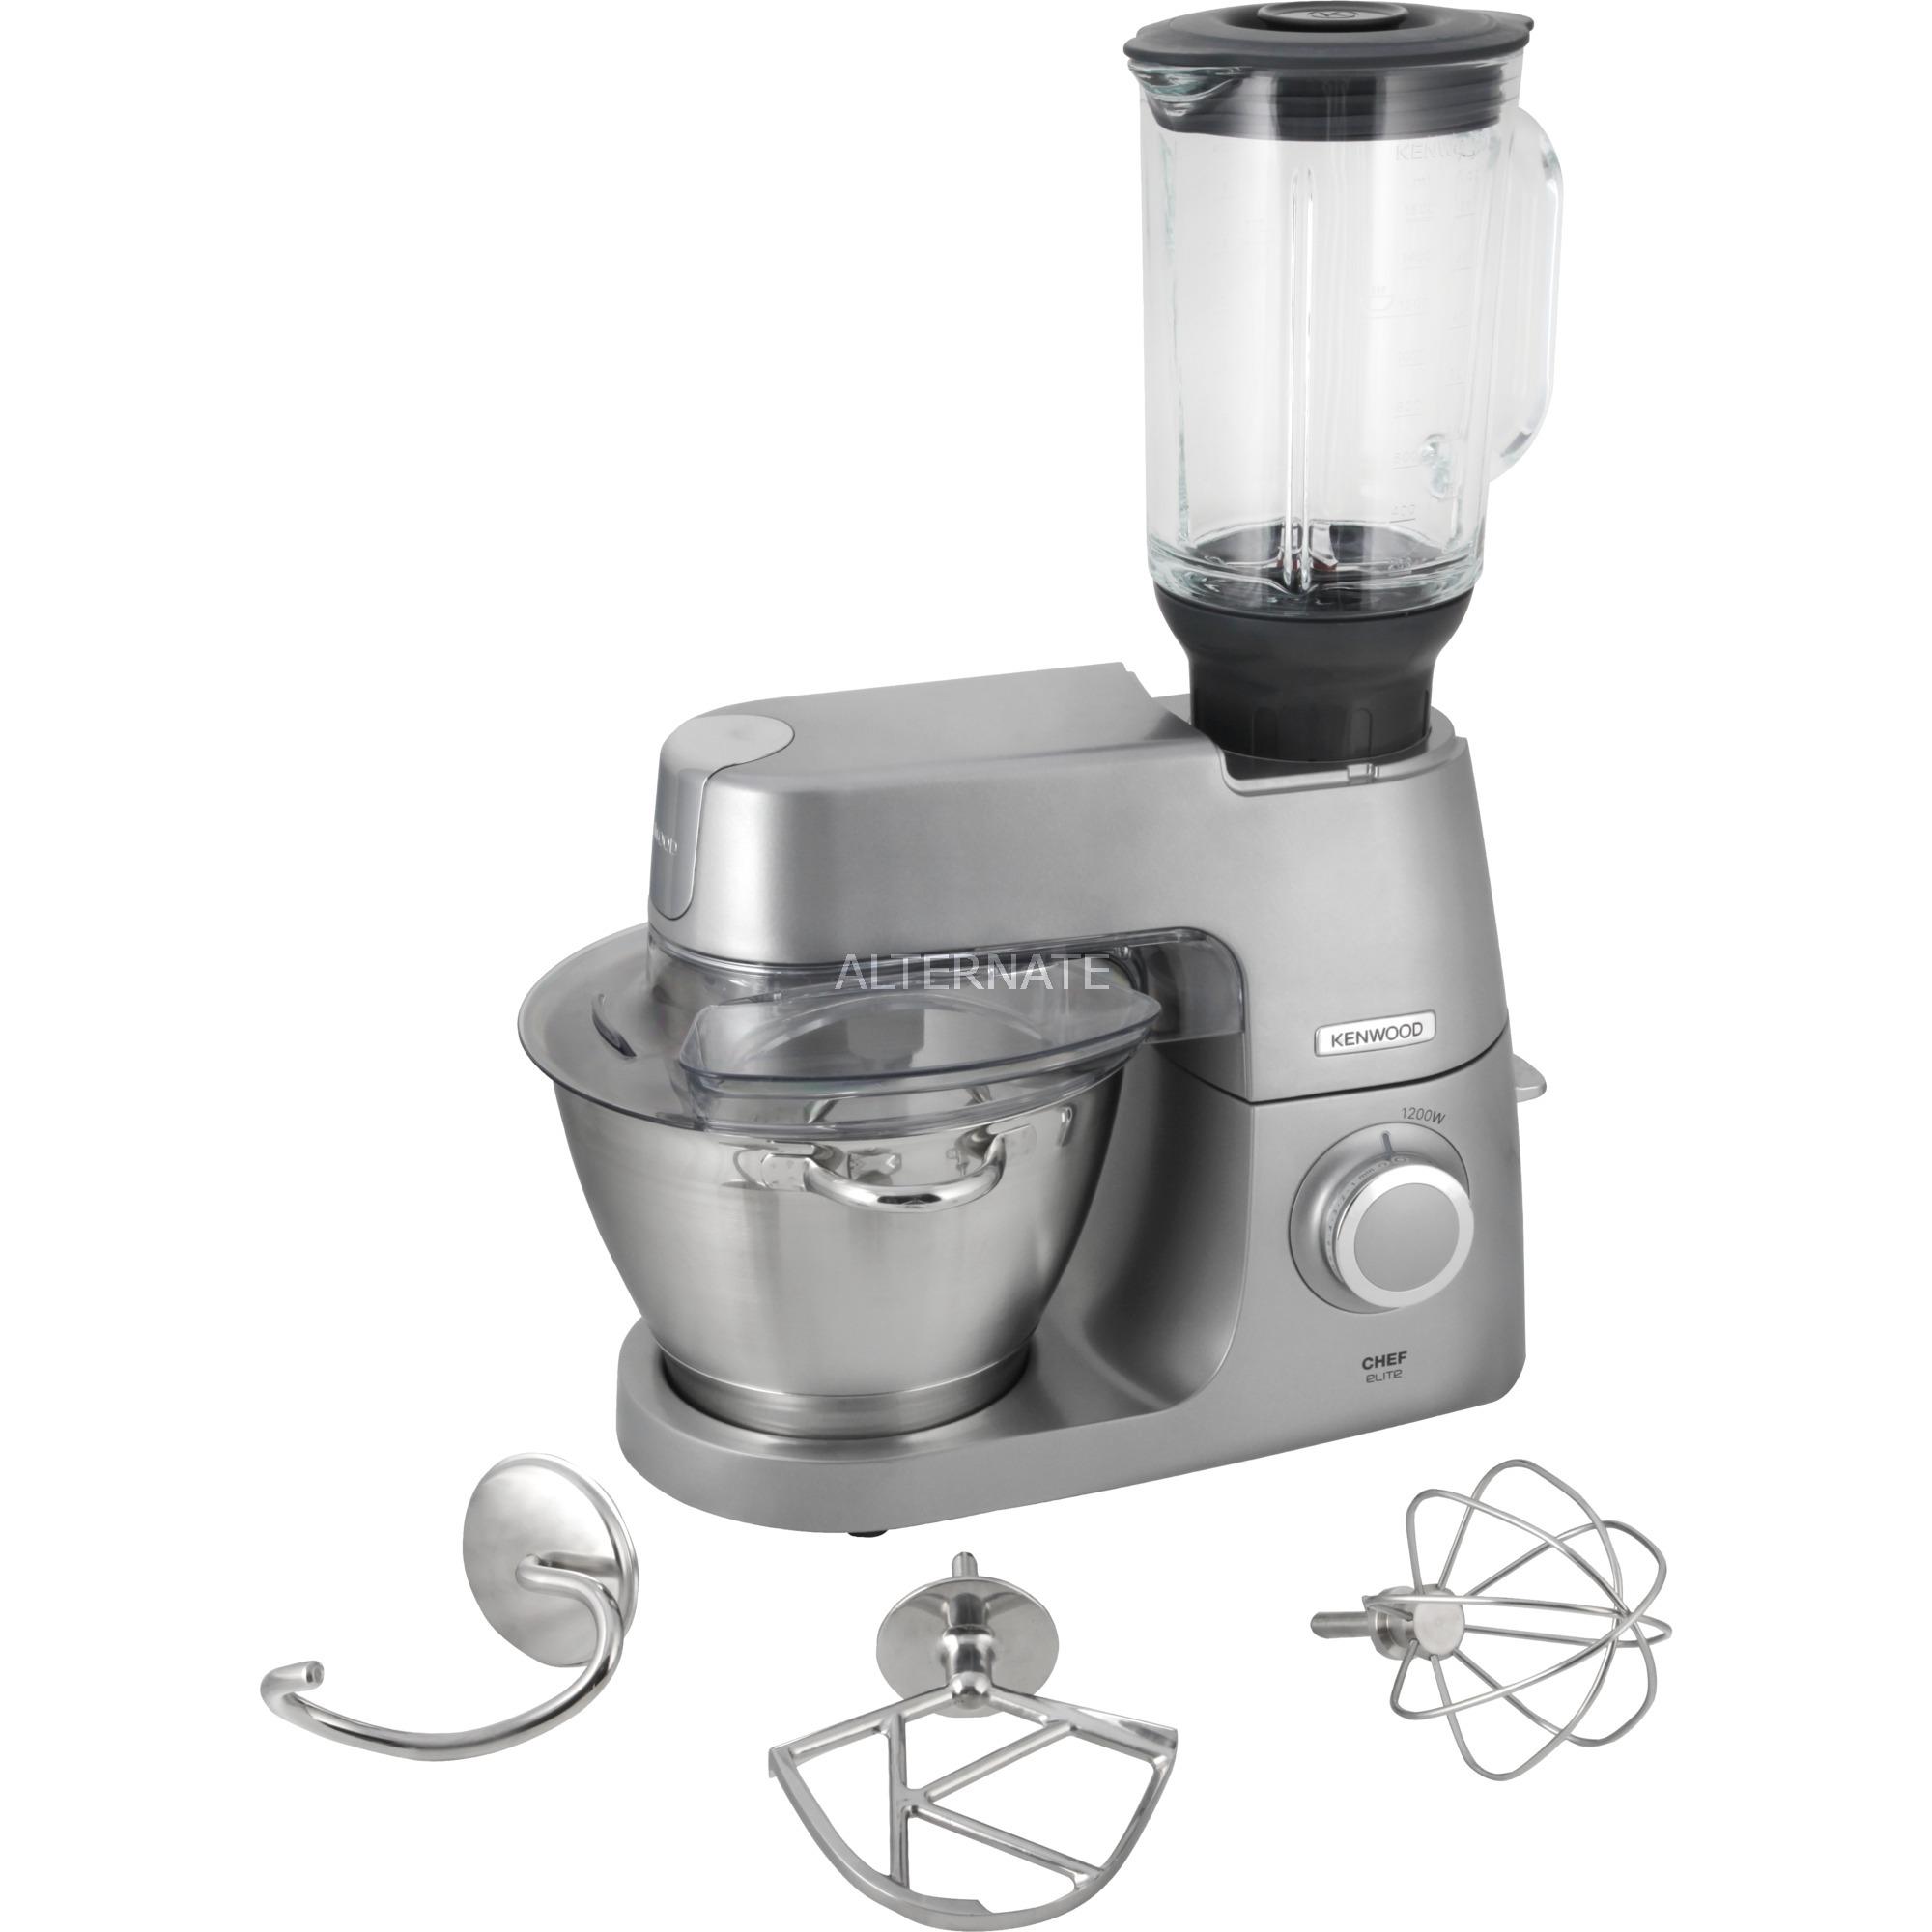 Kenwood Chef Elite robot da cucina 4,6 L Metallico 1200 W argento, 4 ...